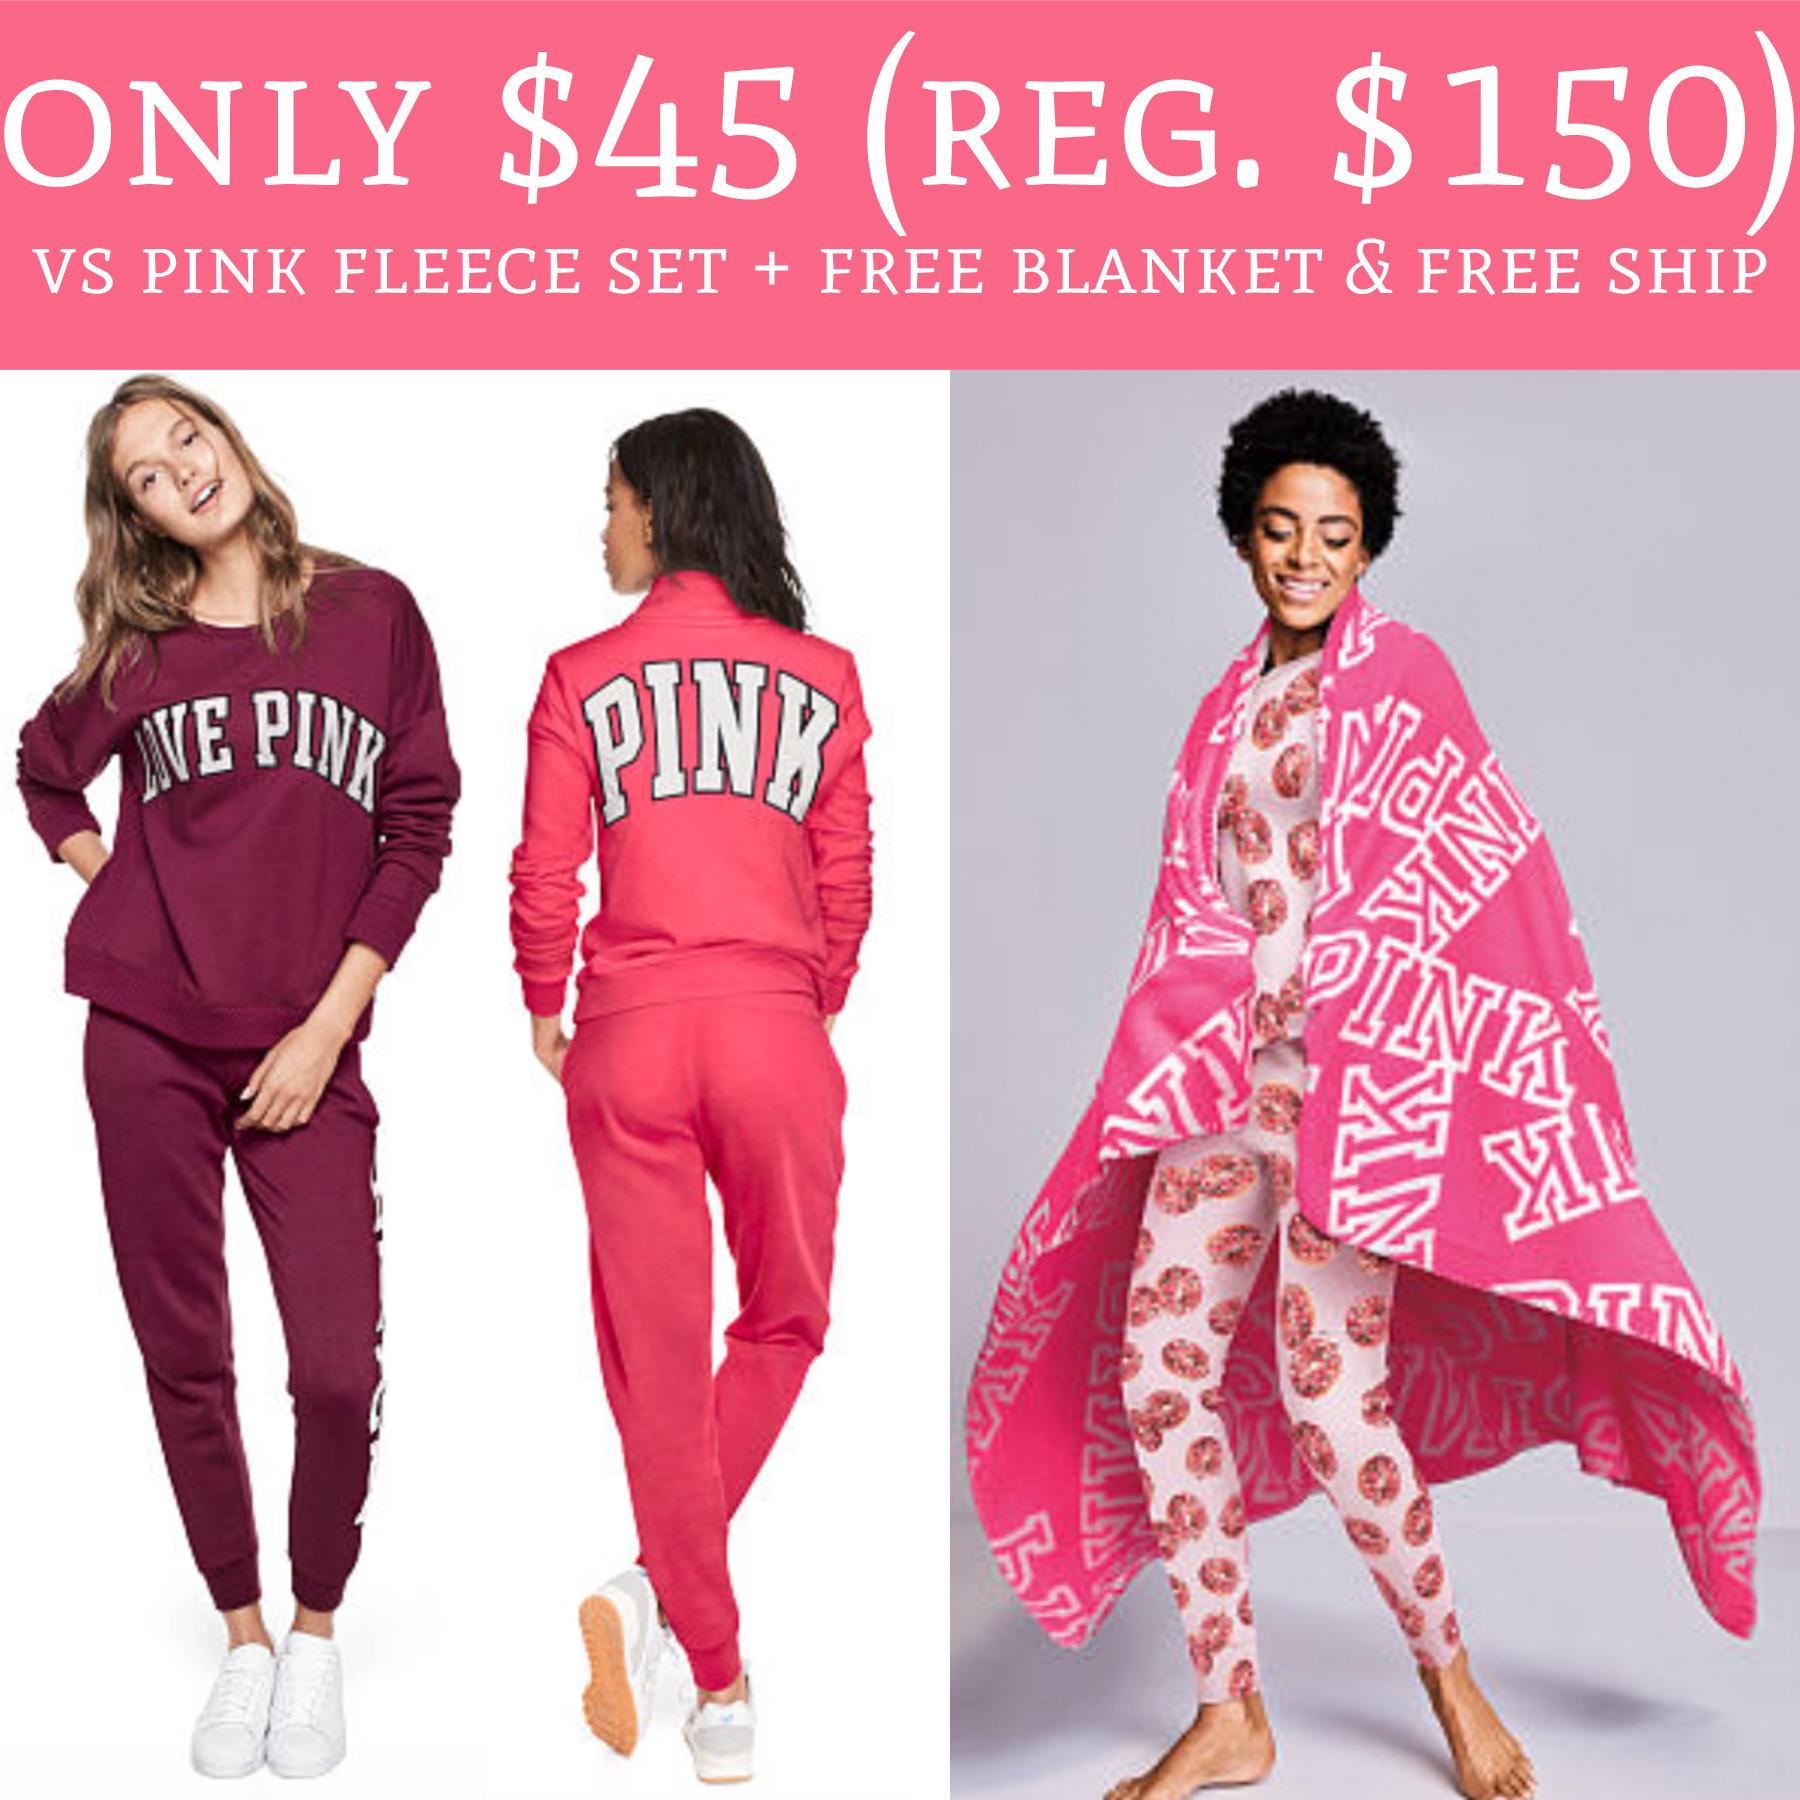 run  only  45  regular  150  victoria u0026 39 s secret pink fleece